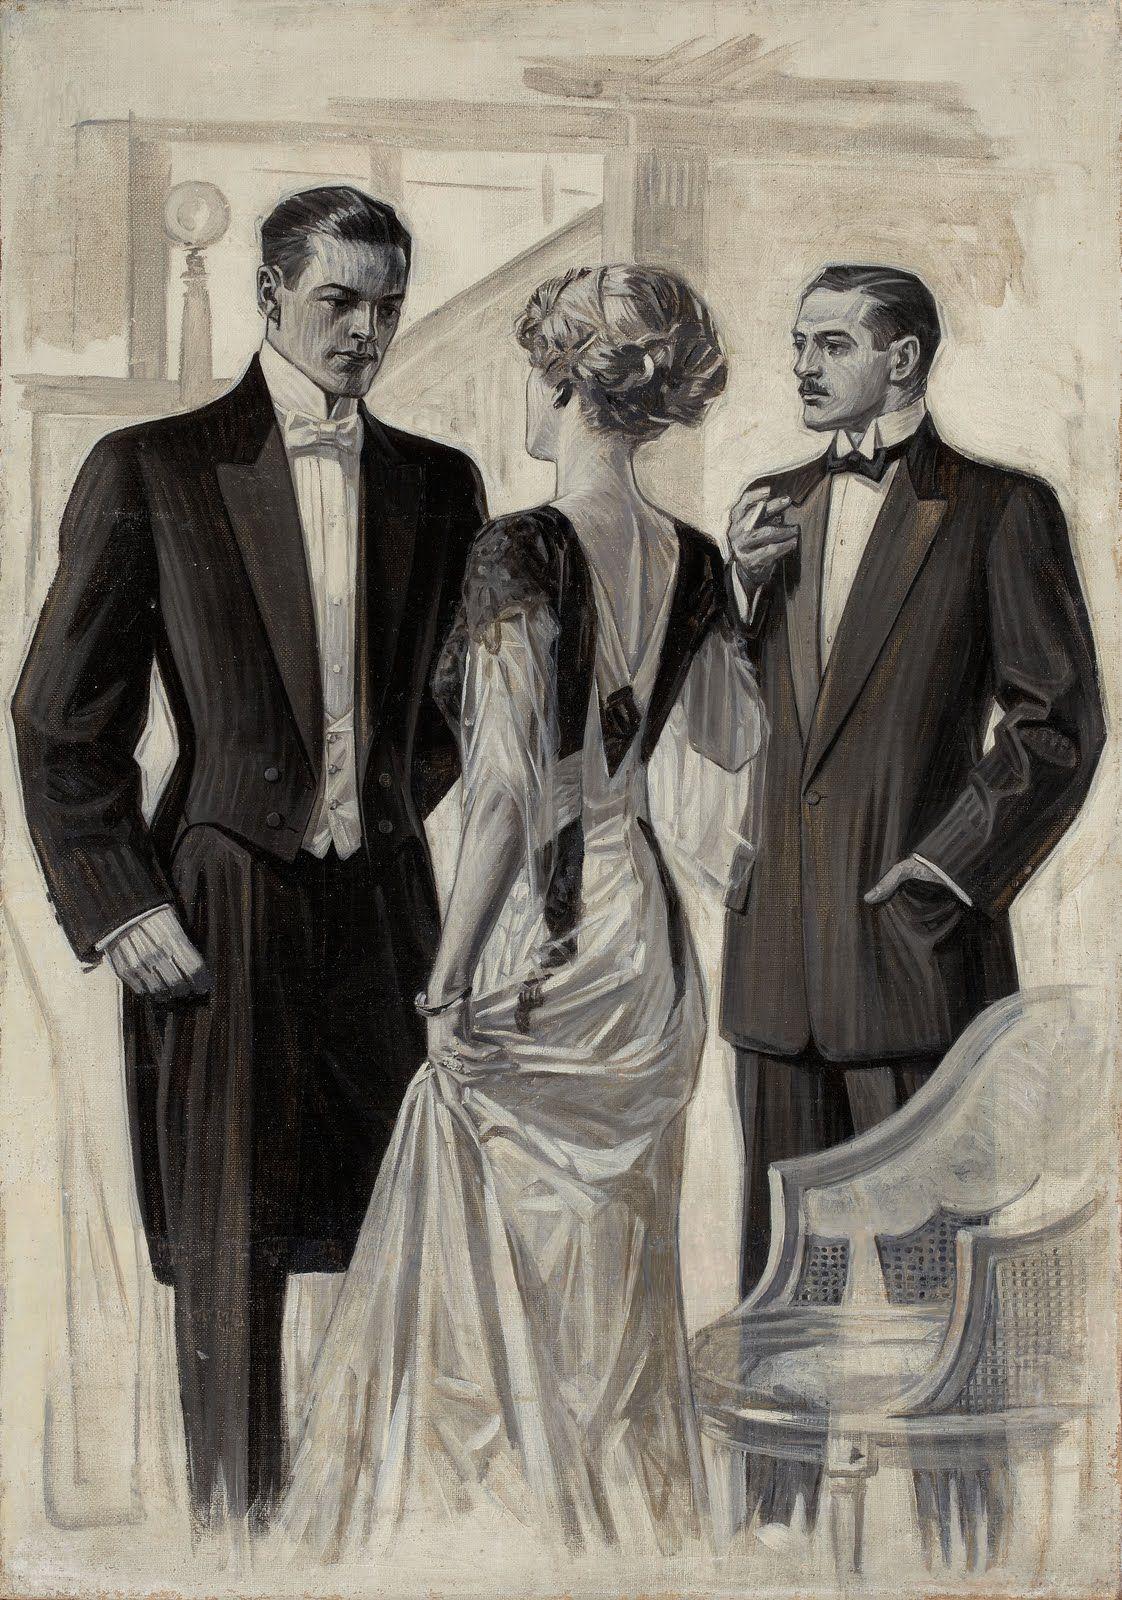 VINTAGE ADVERTISEMENT - J.C. Leyendecker for The Arrow Shirt Co.